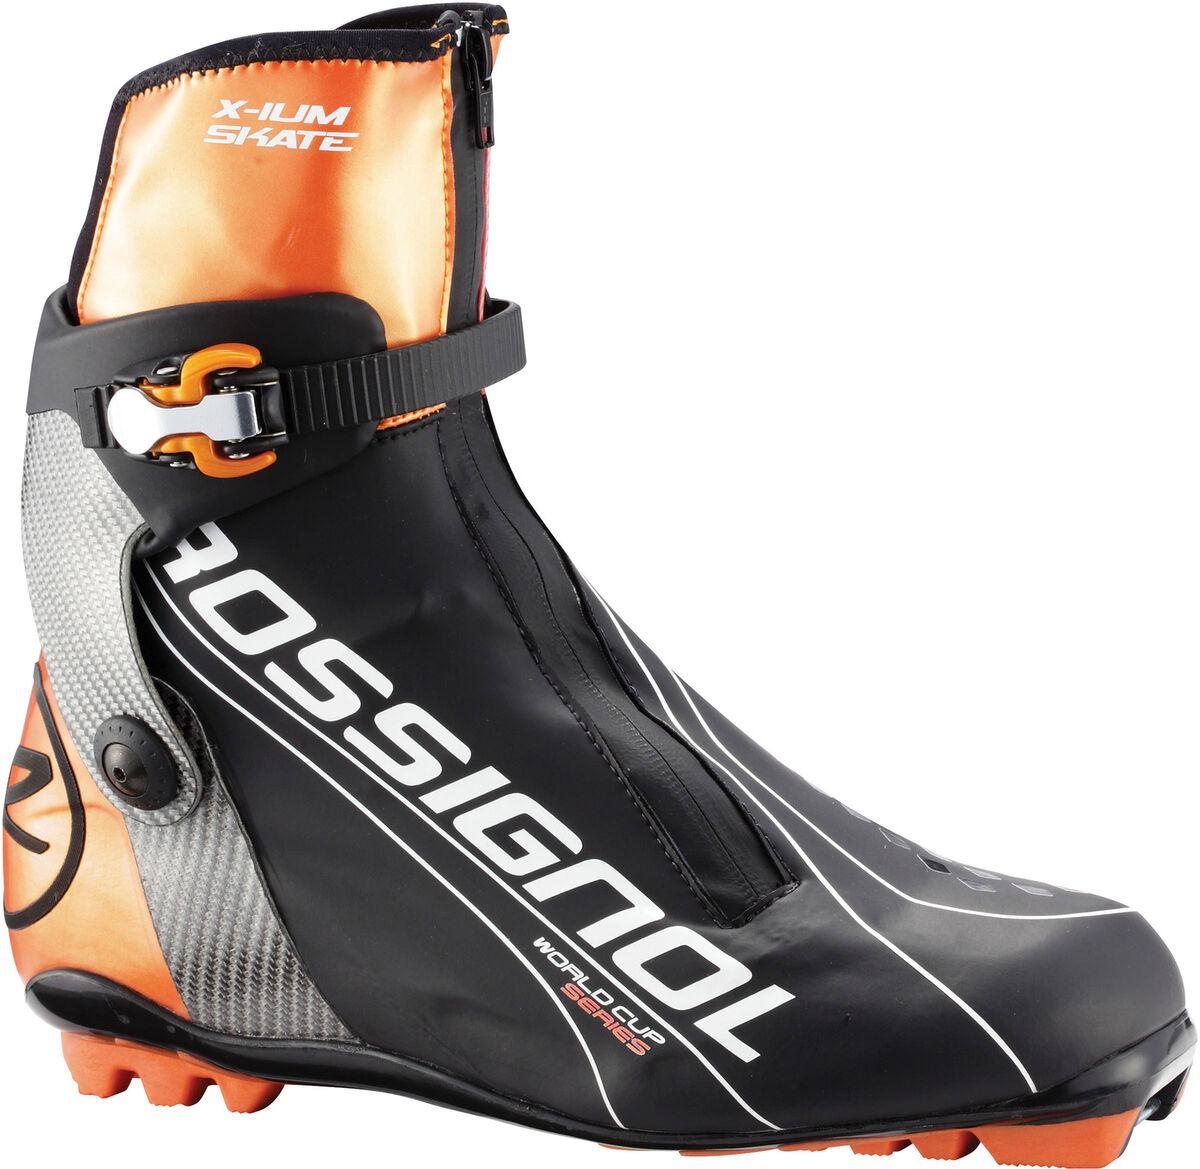 IUM World Cup Skate XC Cross Country Ski Boots Black Solar 42 0